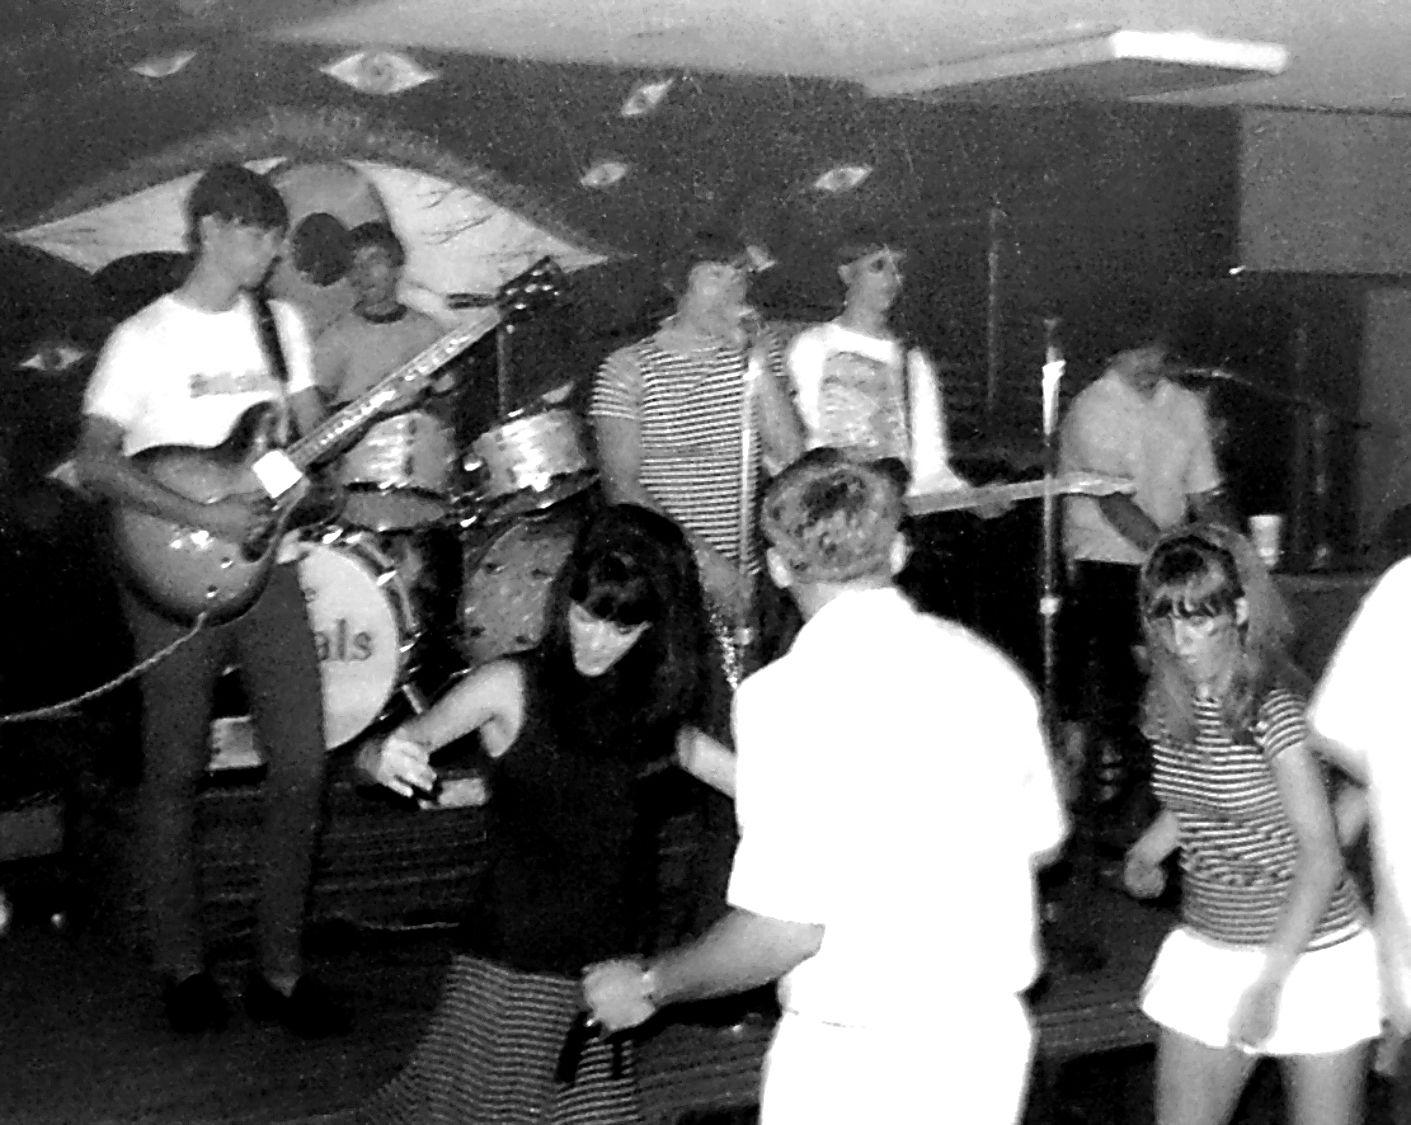 The Jackals, a '60s-era North Texas rock band, perform at the Three Thieves.